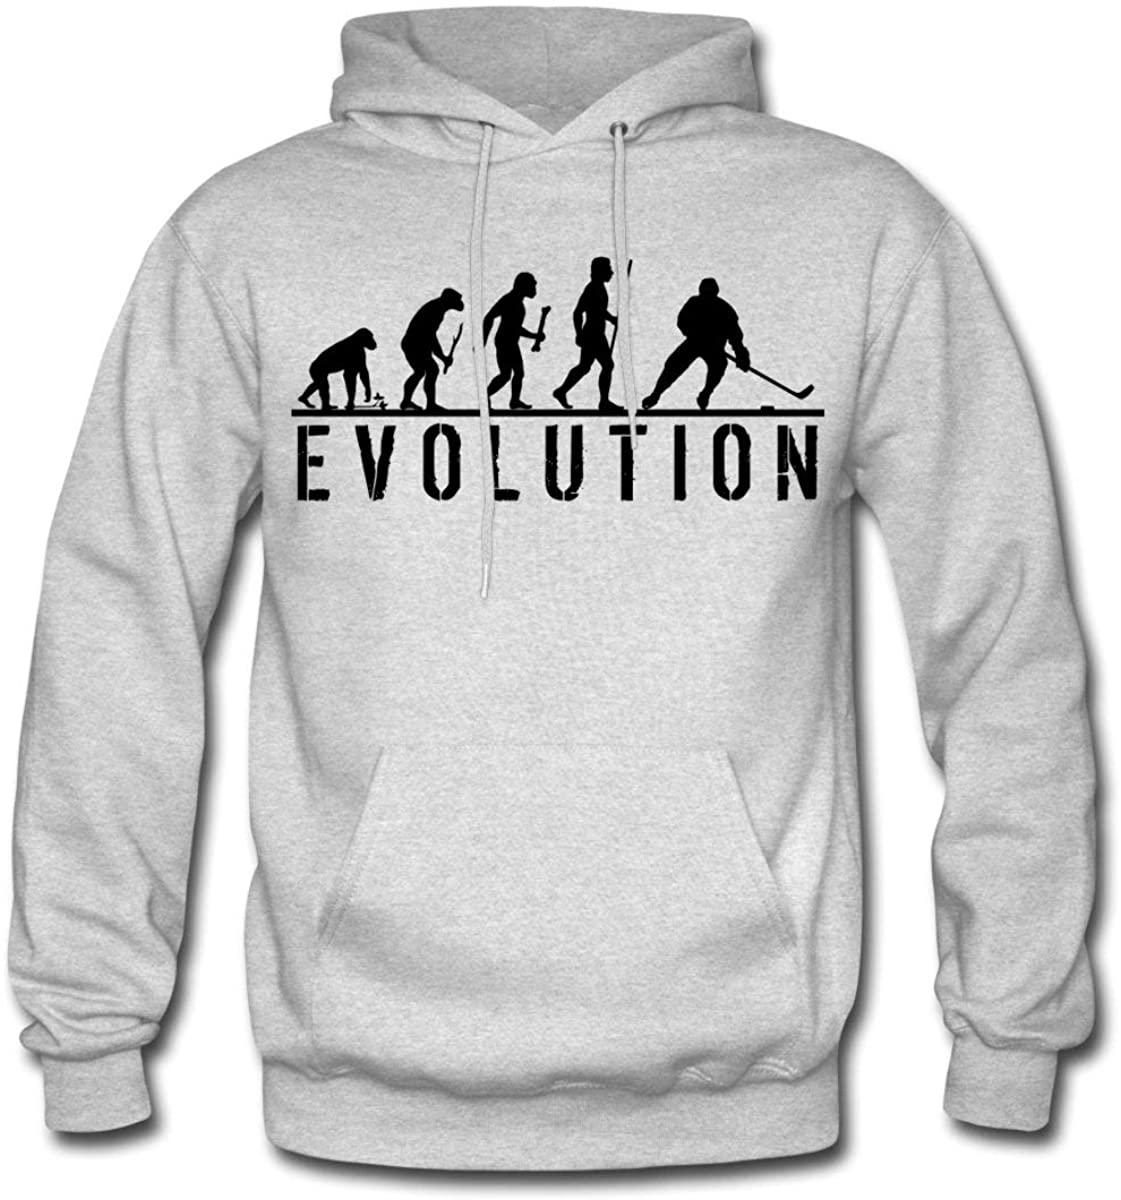 Evolution Ice Hockey Men's Hoodie